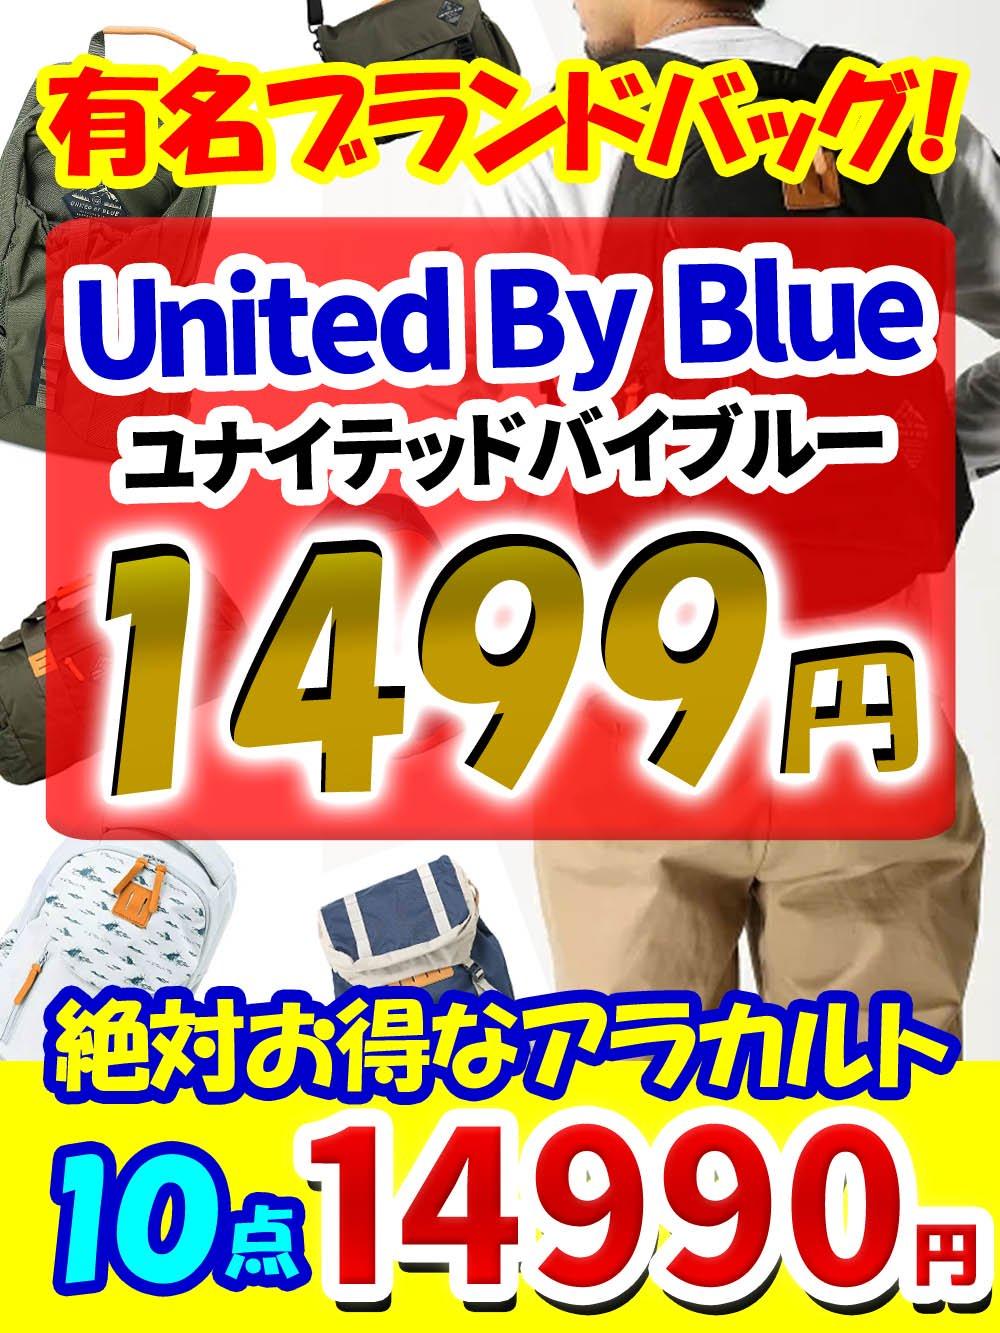 【Unitedbyblueユナイテッドバイブルー】有名ブランドバッグのアラカルト@1499